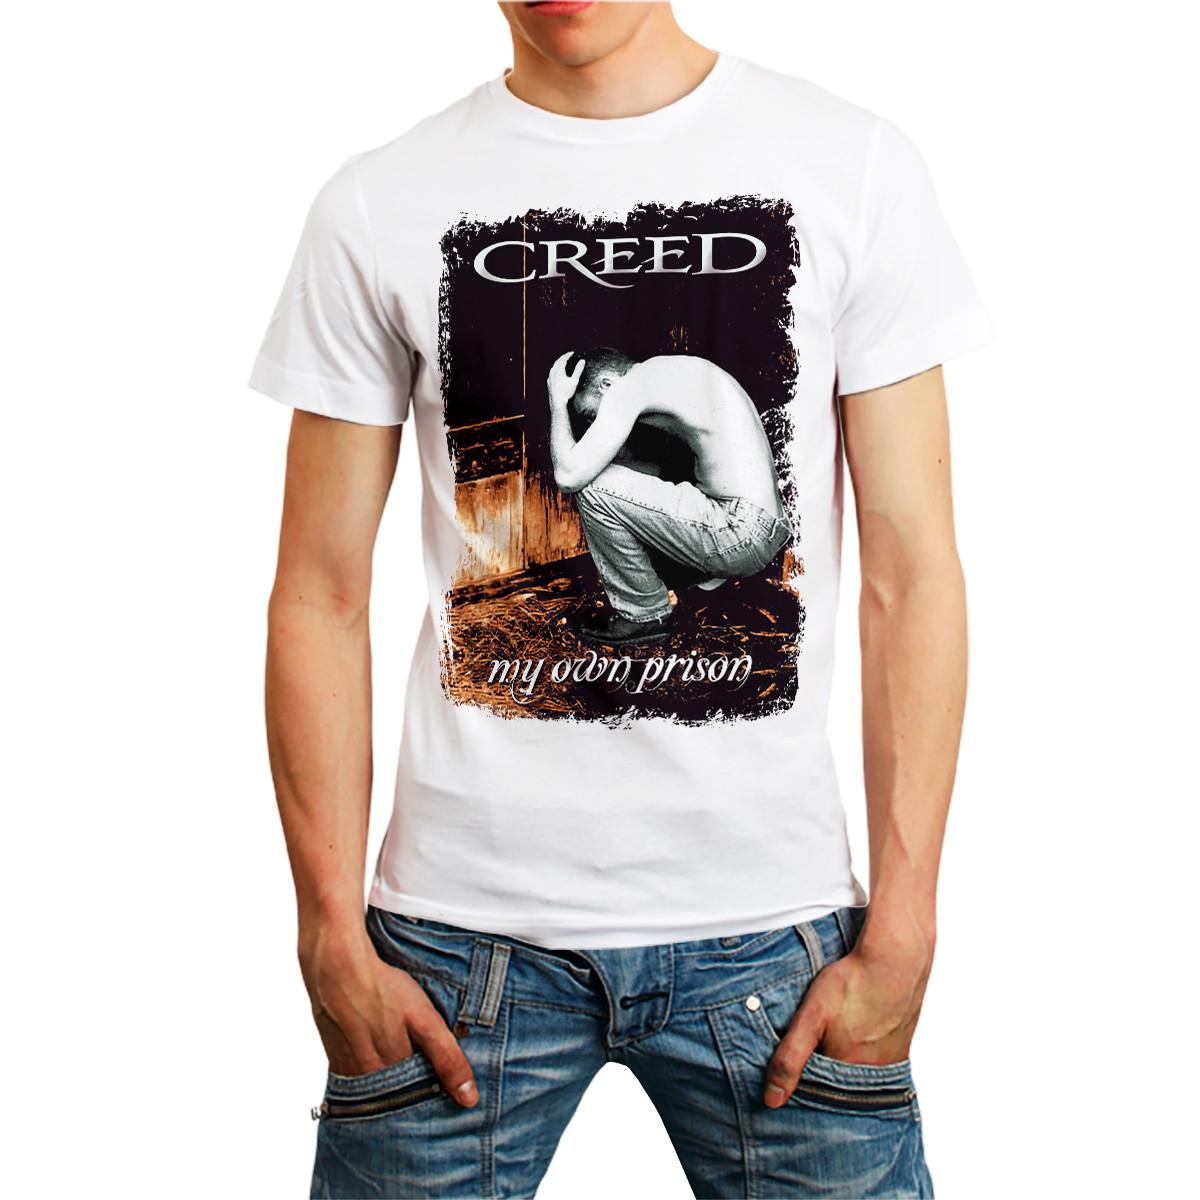 Camisa Camiseta Personalizada Banda de Rock Oficina G3 2  c4ab8130cd145